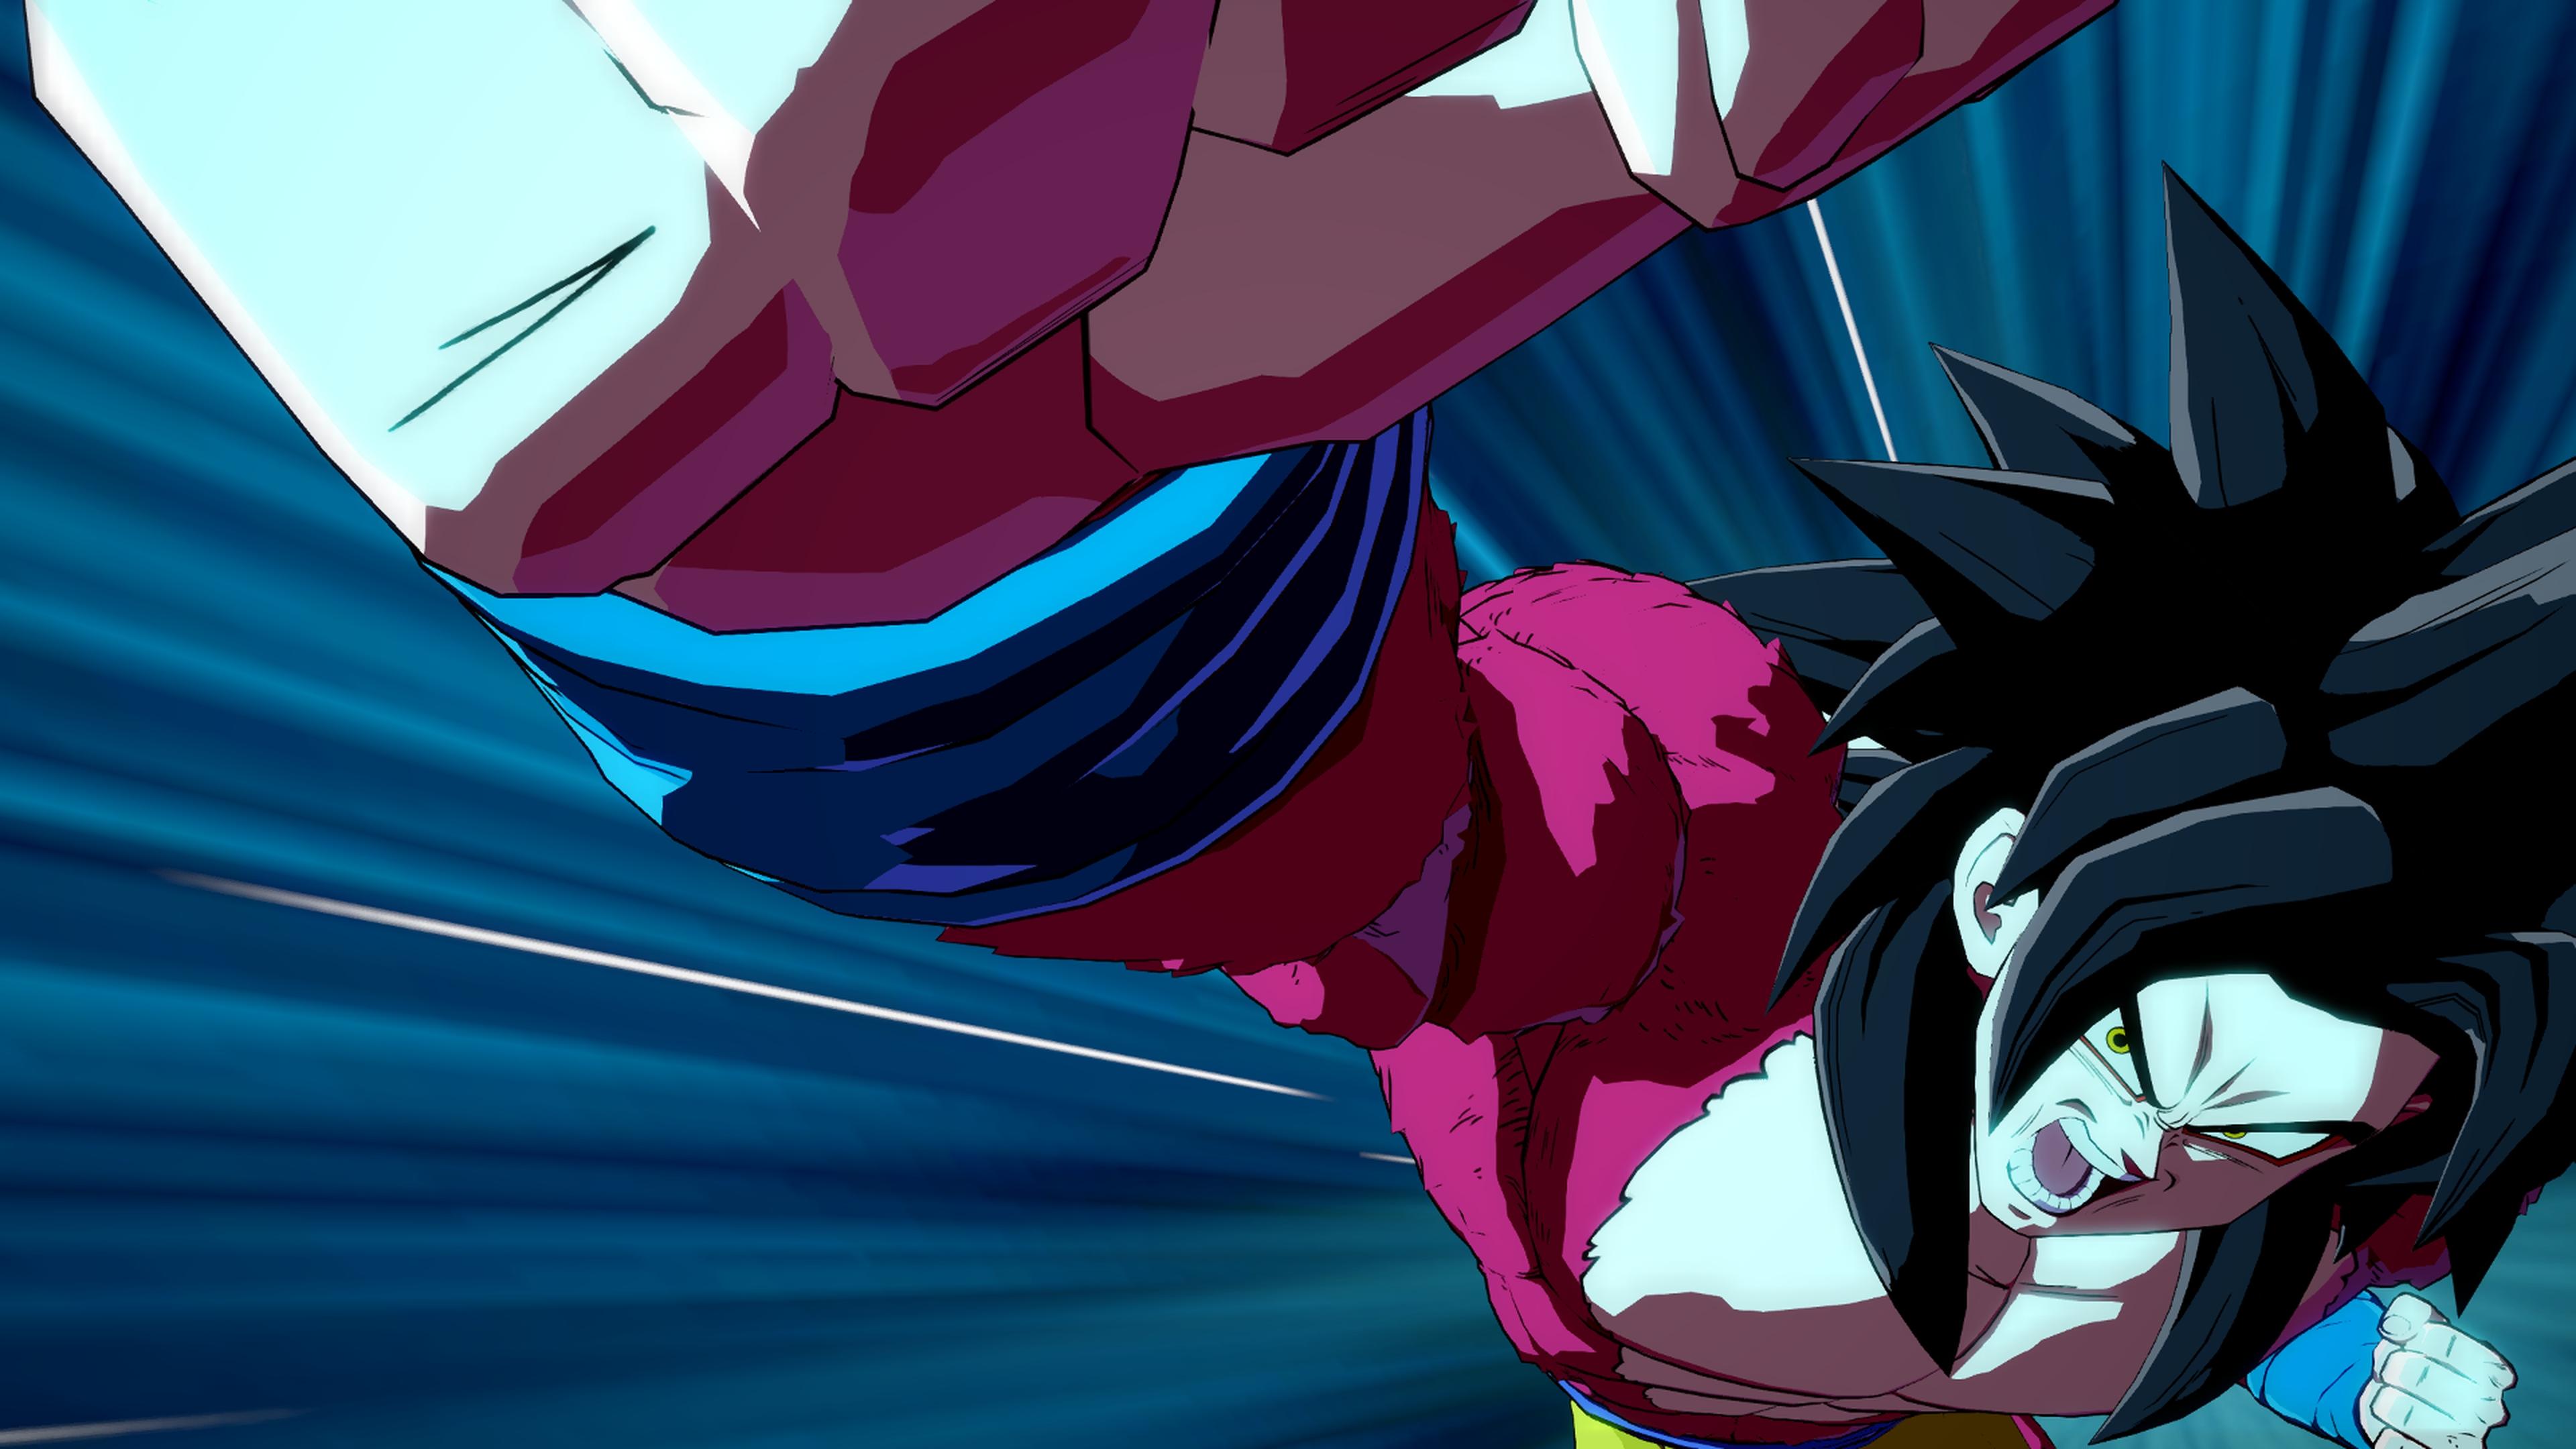 Dragon Ball FighterZ's Kid Goku GT looks devastating when he transforms into Super Saiyan 4 screenshot